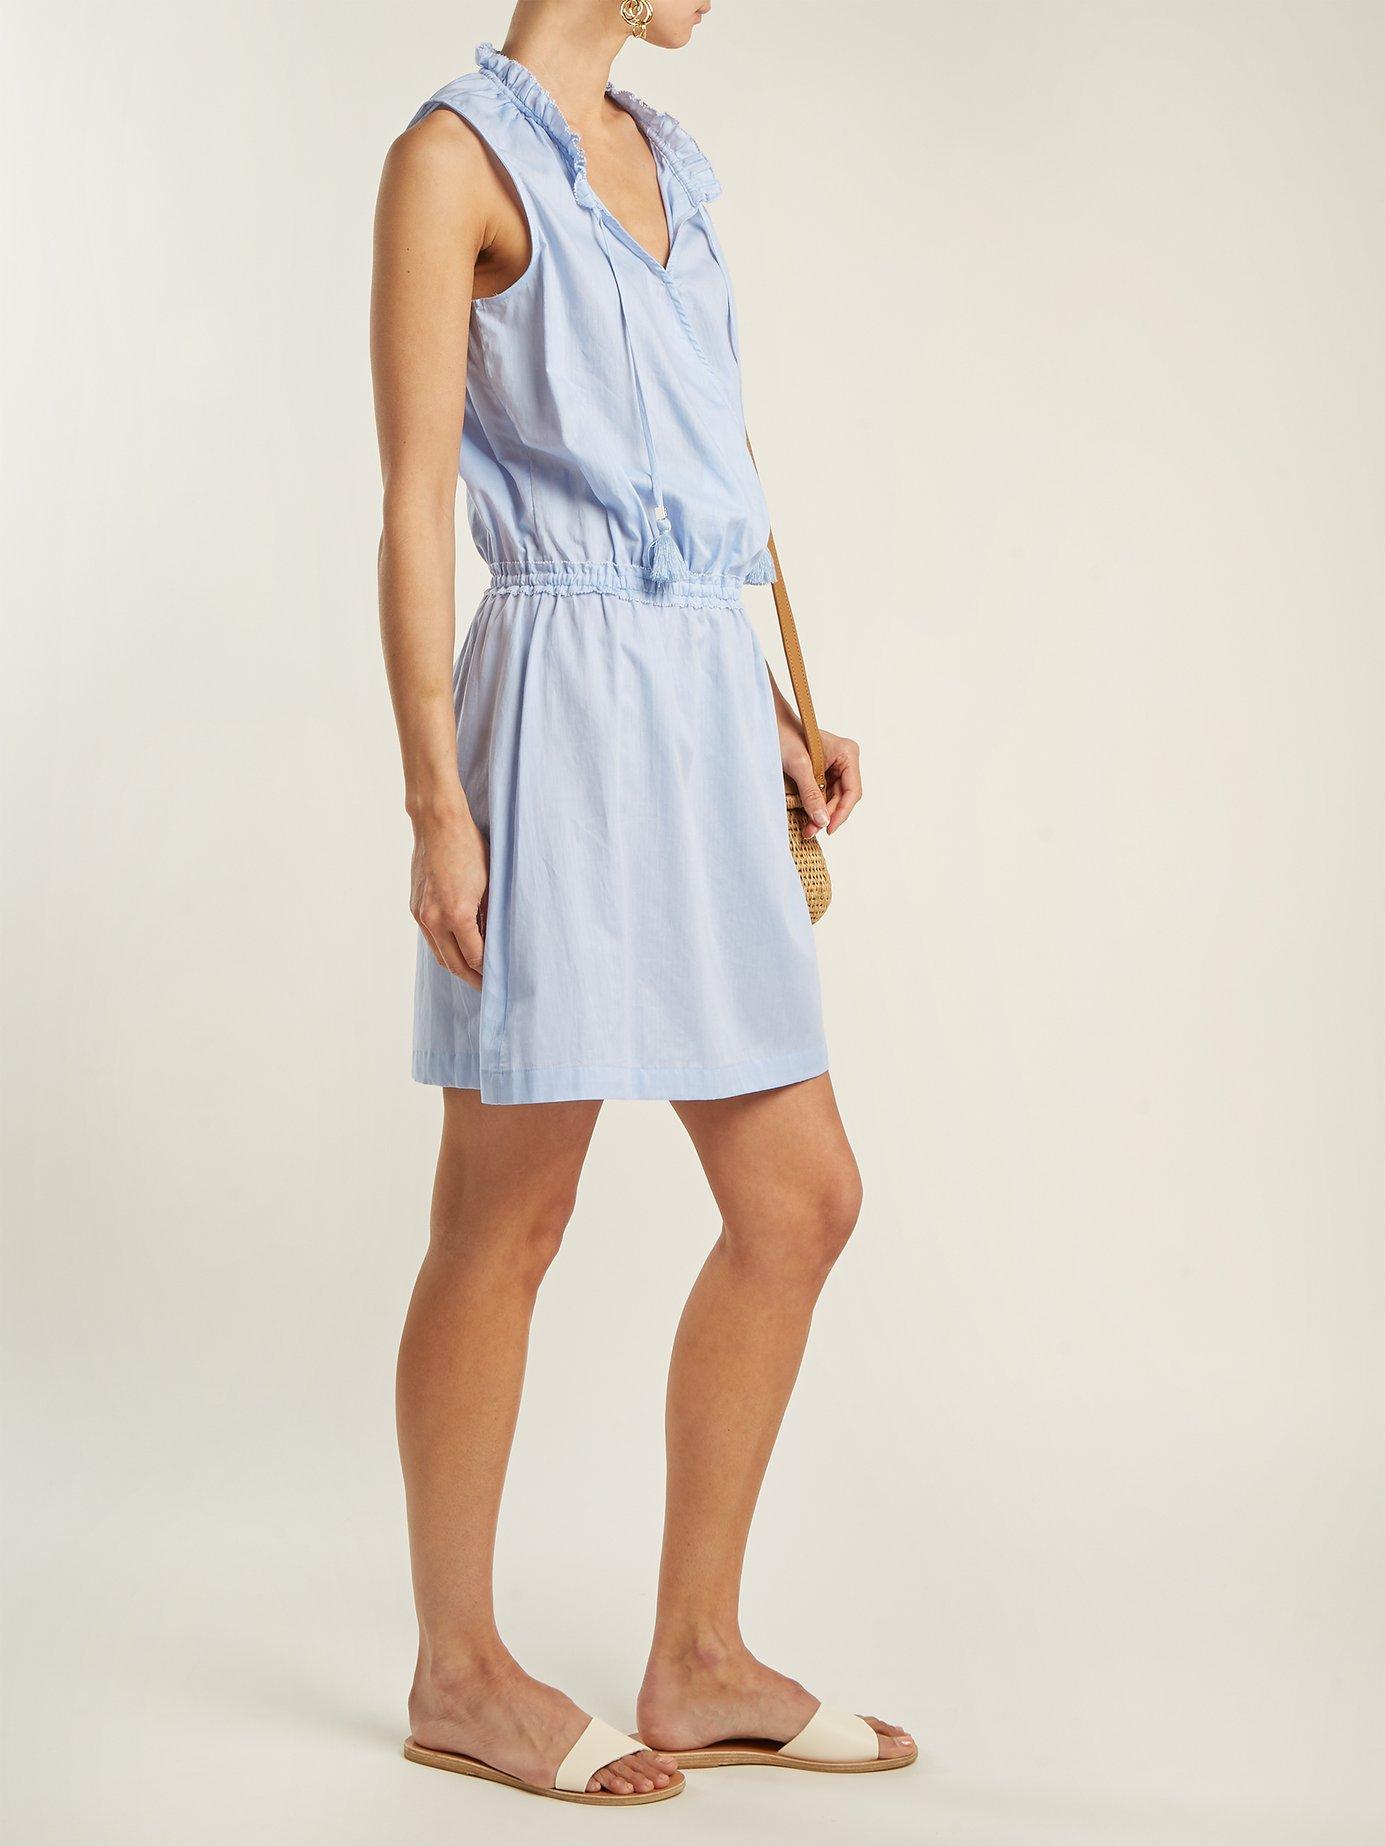 Cassis wrap-front cotton dress by Heidi Klein